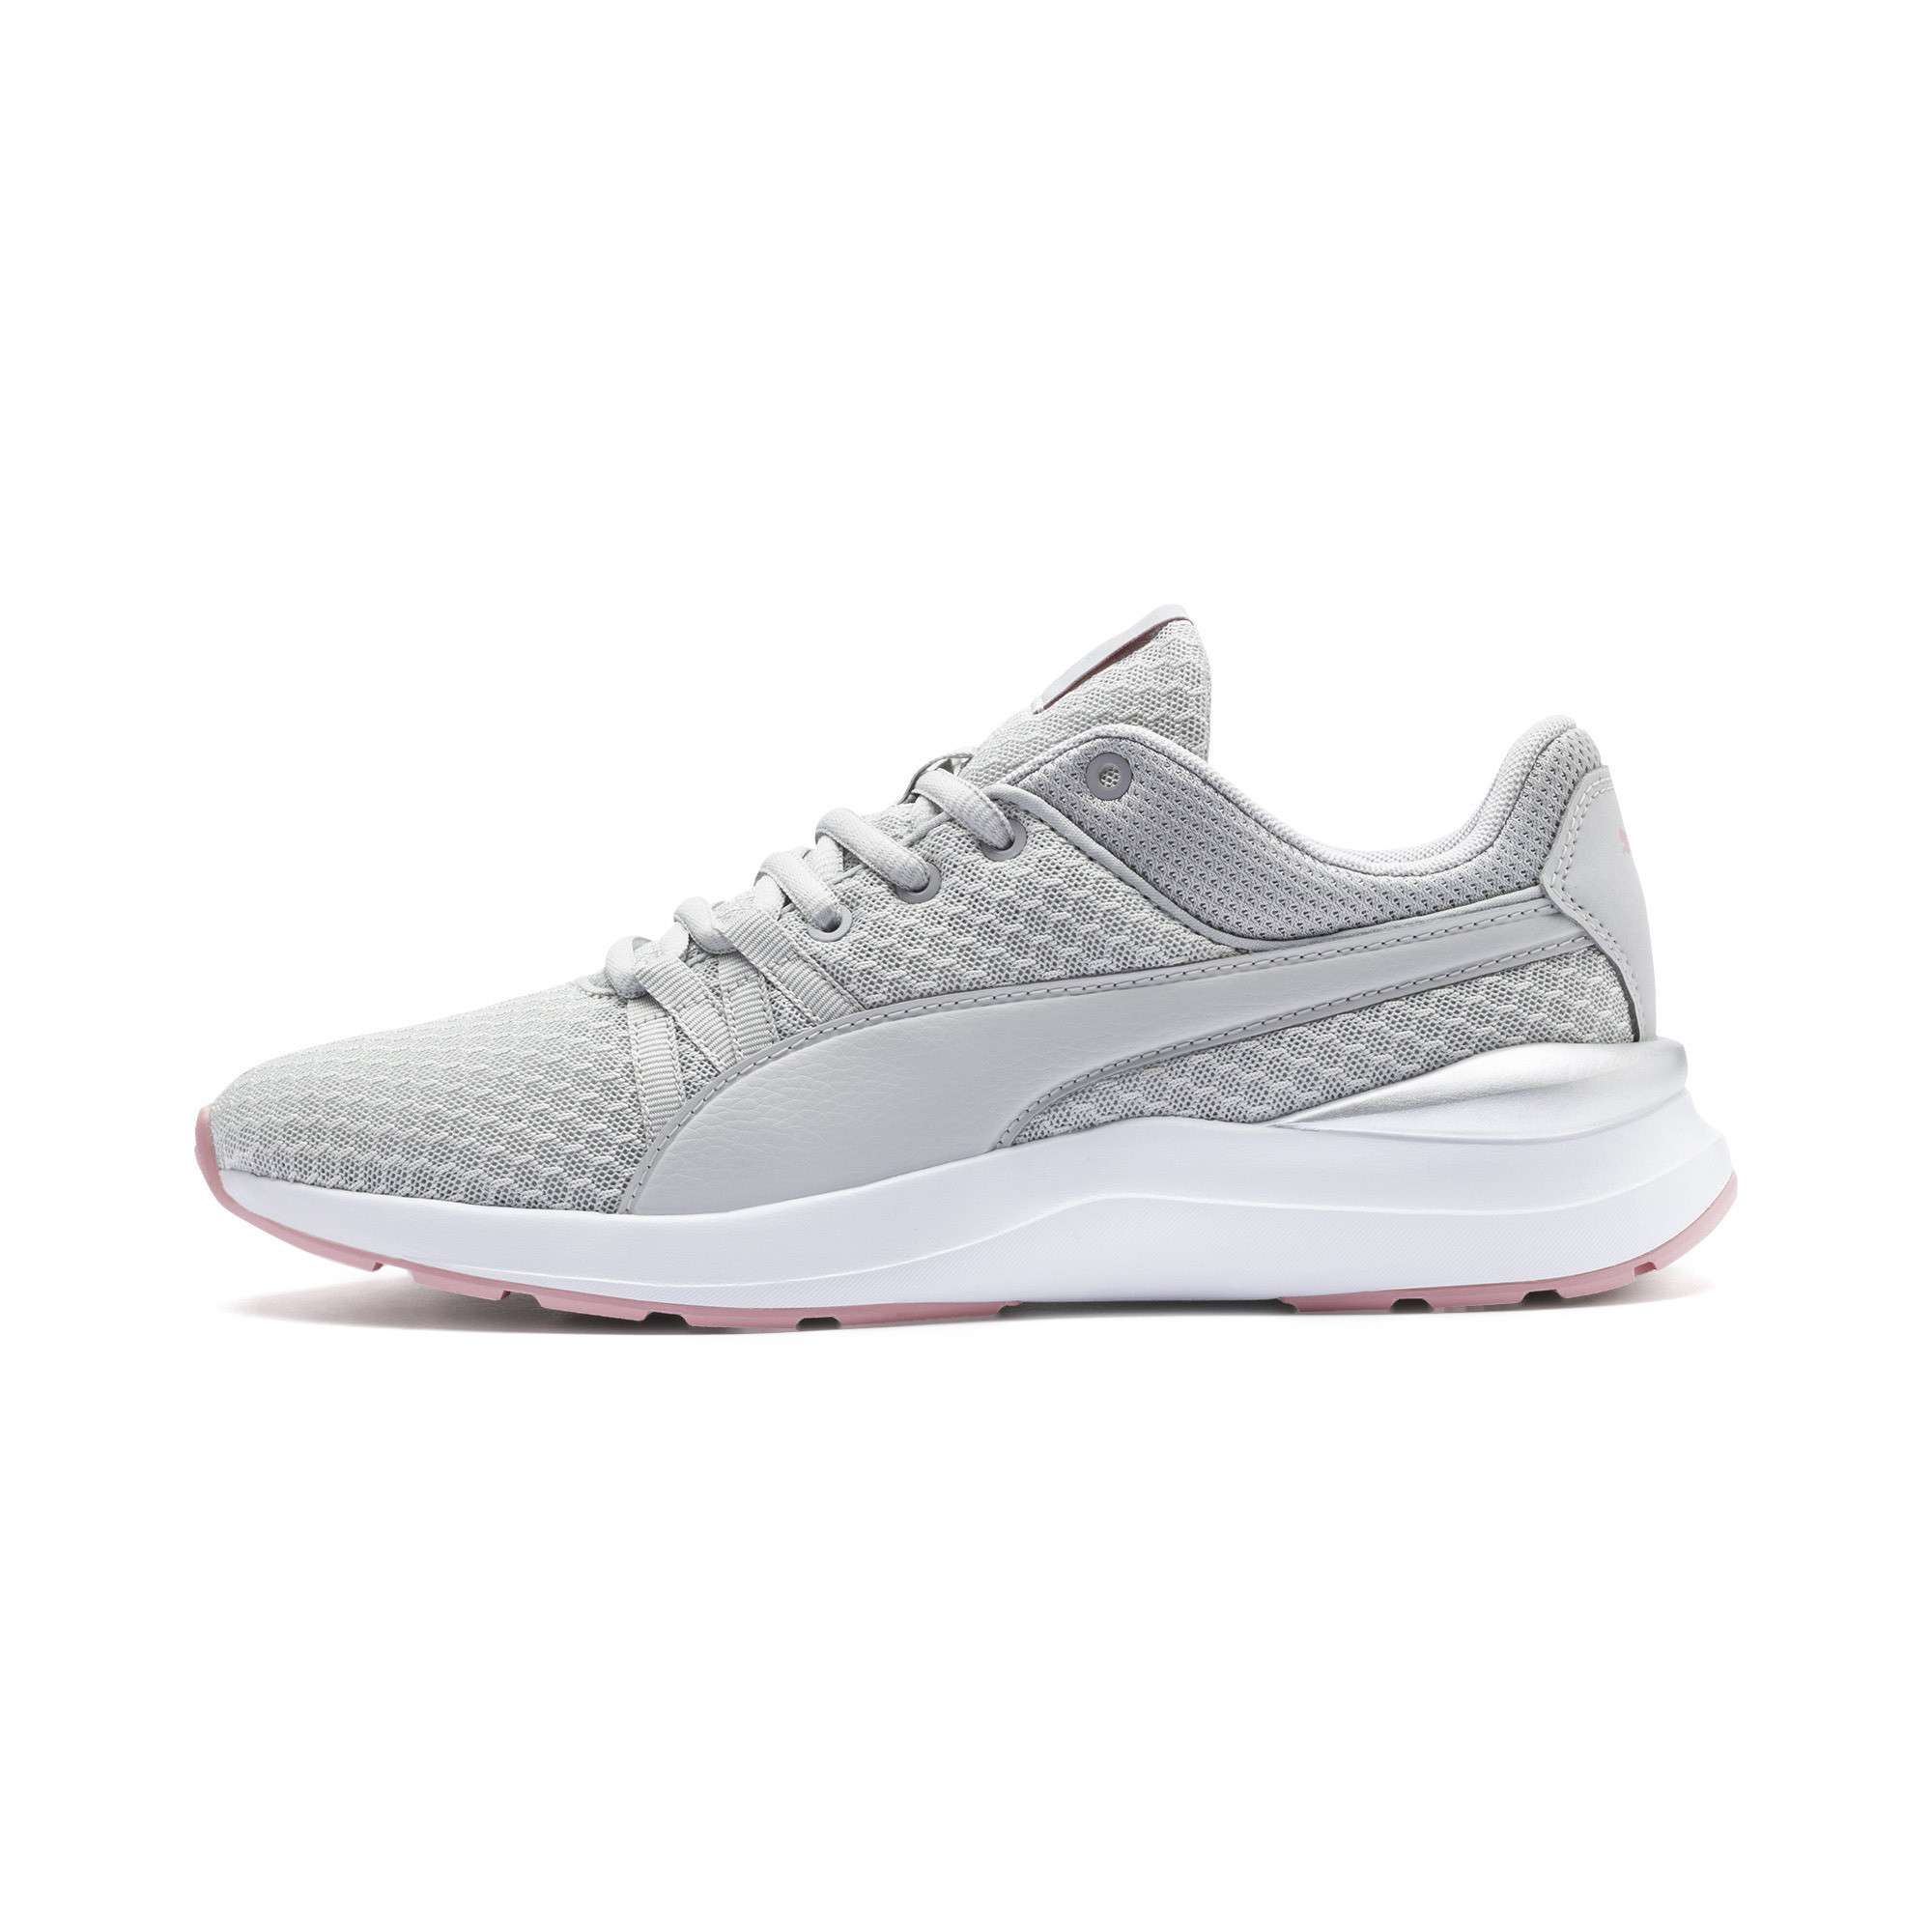 PUMA-Adela-Core-Women-s-Sneakers-Women-Shoe-Basics thumbnail 11